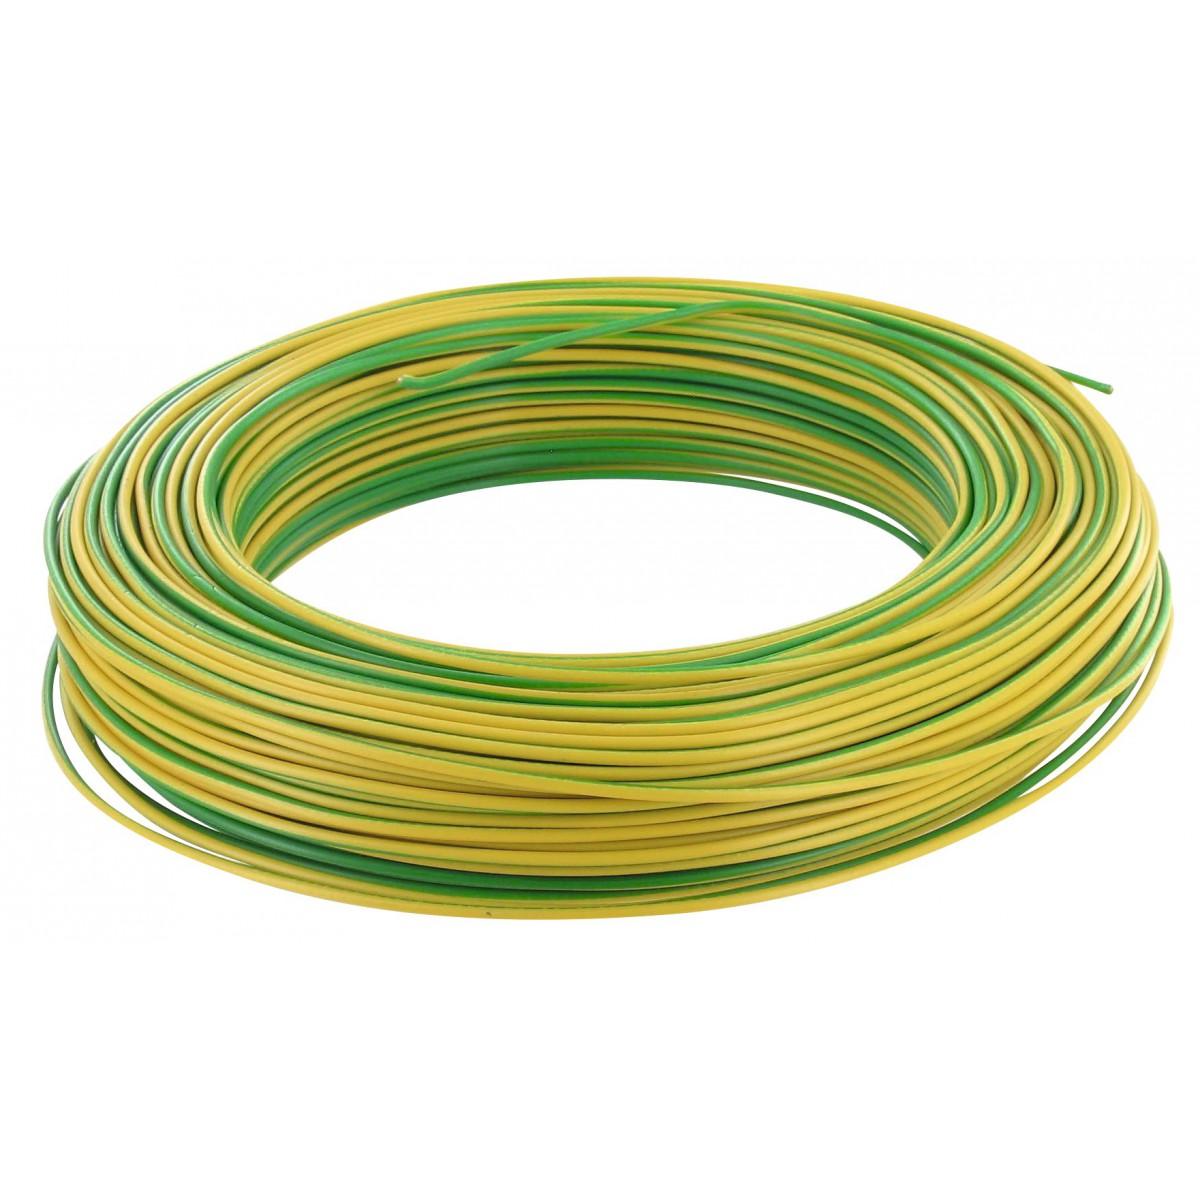 Fil H07 V-U 1,5 mm² - Couronne 100 m - Vert / jaune